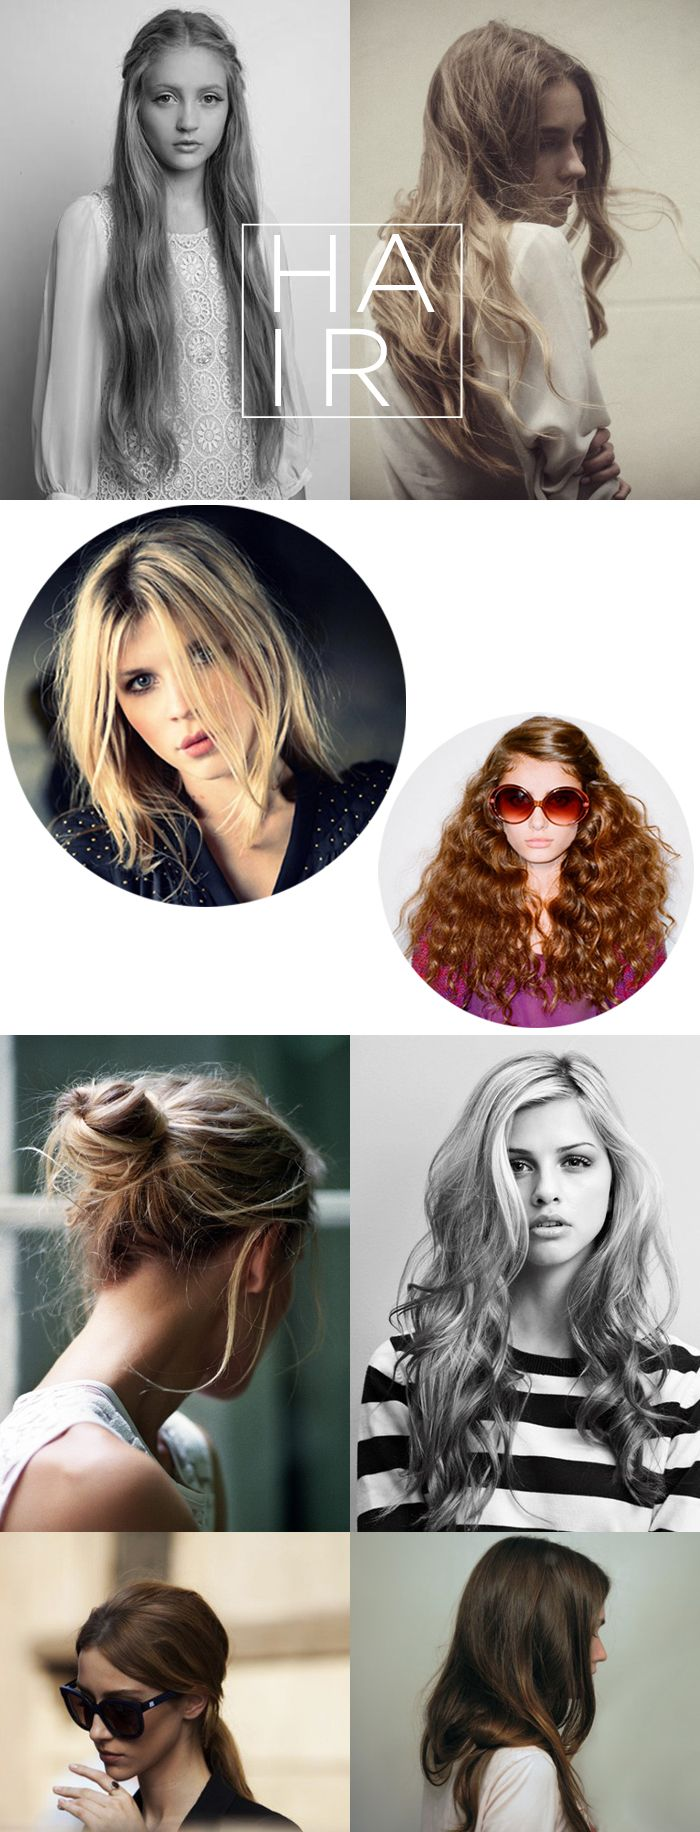 hair inspirationGorgeous Long, Amm Blog, Style Hair, Long Hair, Beautiful, Gorgeous Hair, Hippie Hair, Long Hippie, Hair Inspiration